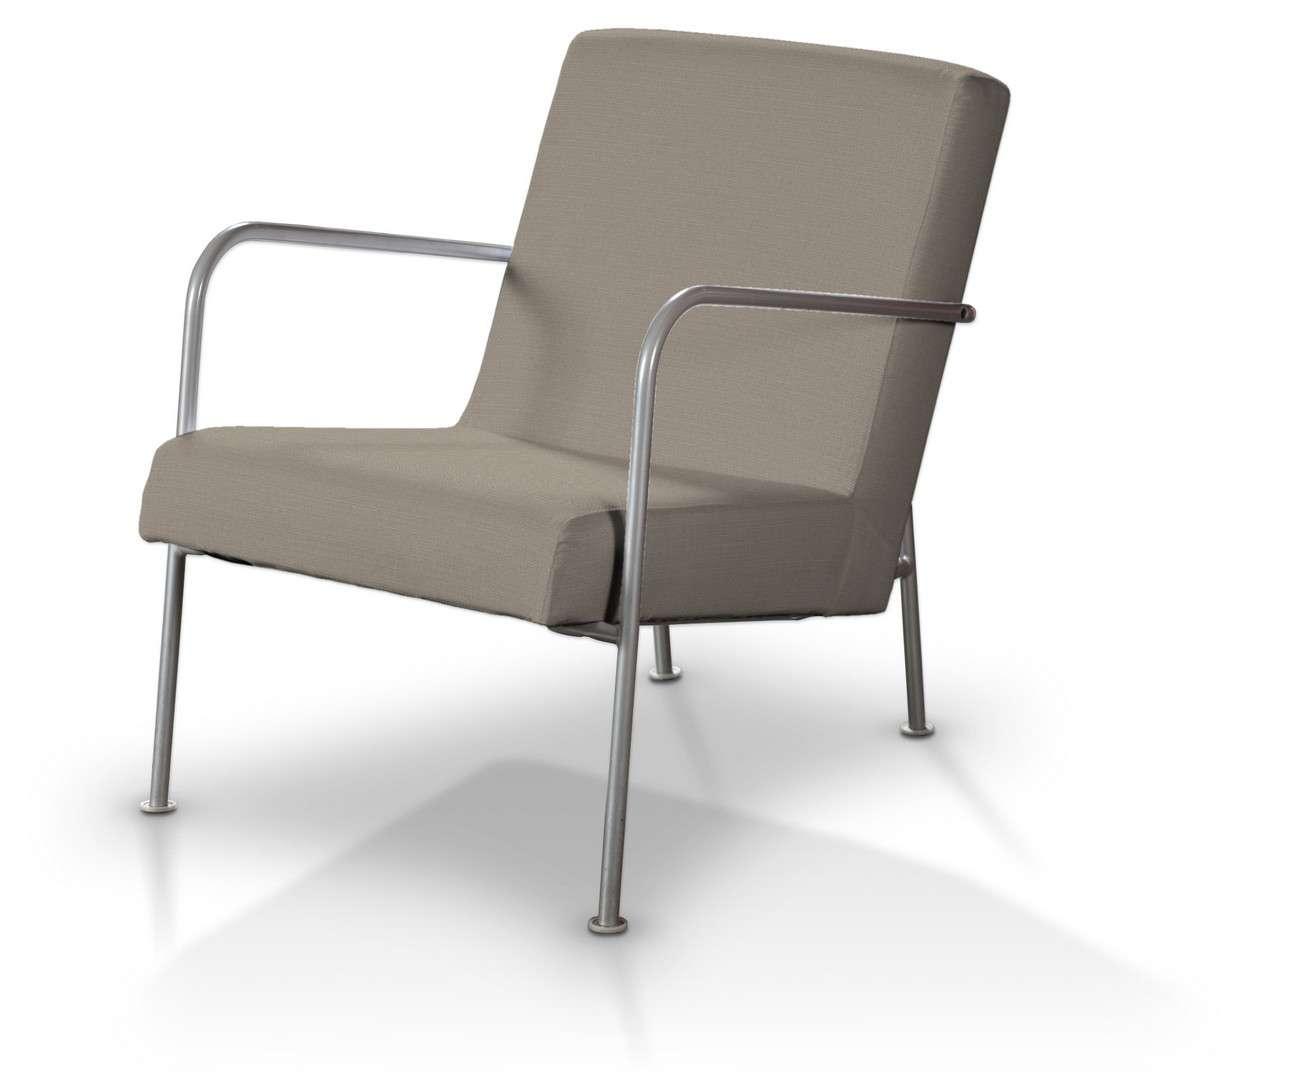 Potah na křeslo Ikea PS v kolekci Living, látka: 161-53